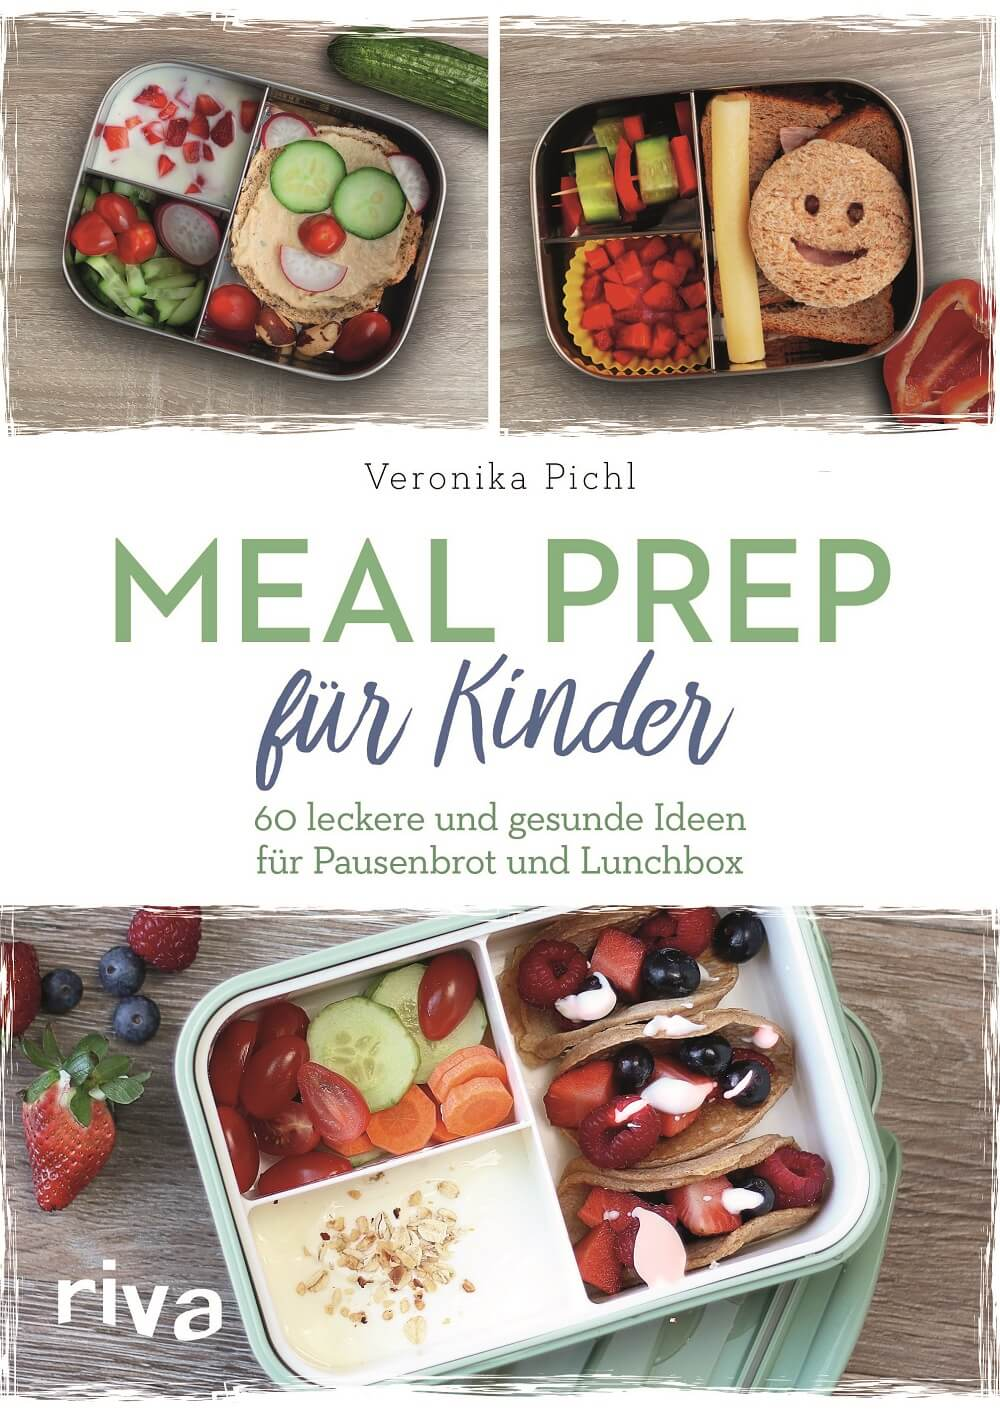 Meal Prep für Kinder Buch Bonus